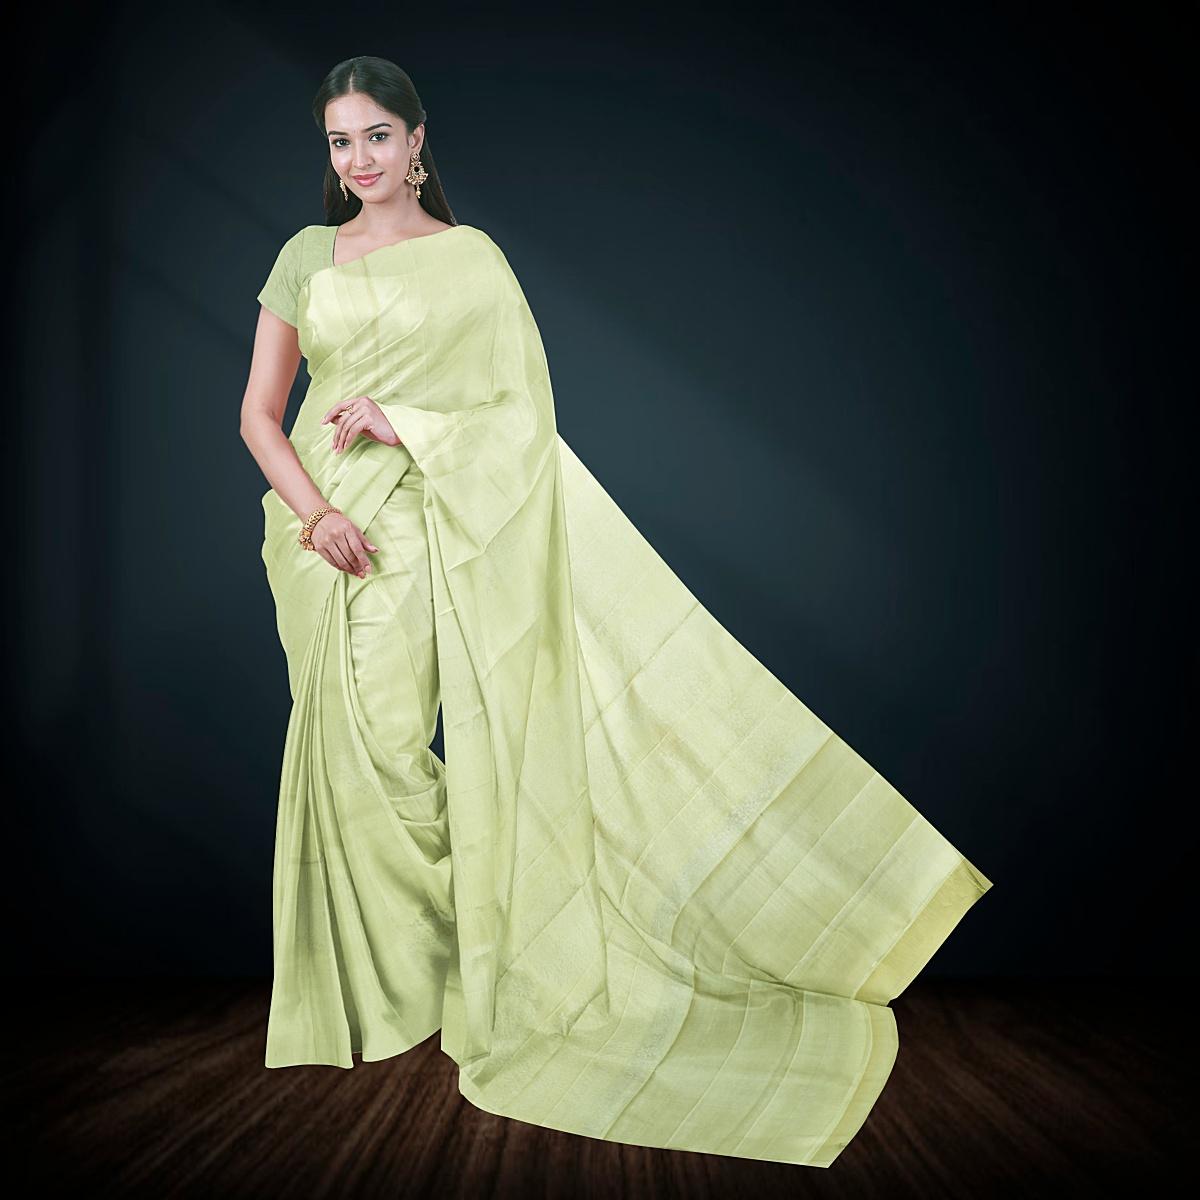 Tri3d Softsilk2 Silk Set3 Pujitha Front 2020 7 24 15 48 19 1200x1200 Kanjivaram Silk Sarees In Chennai